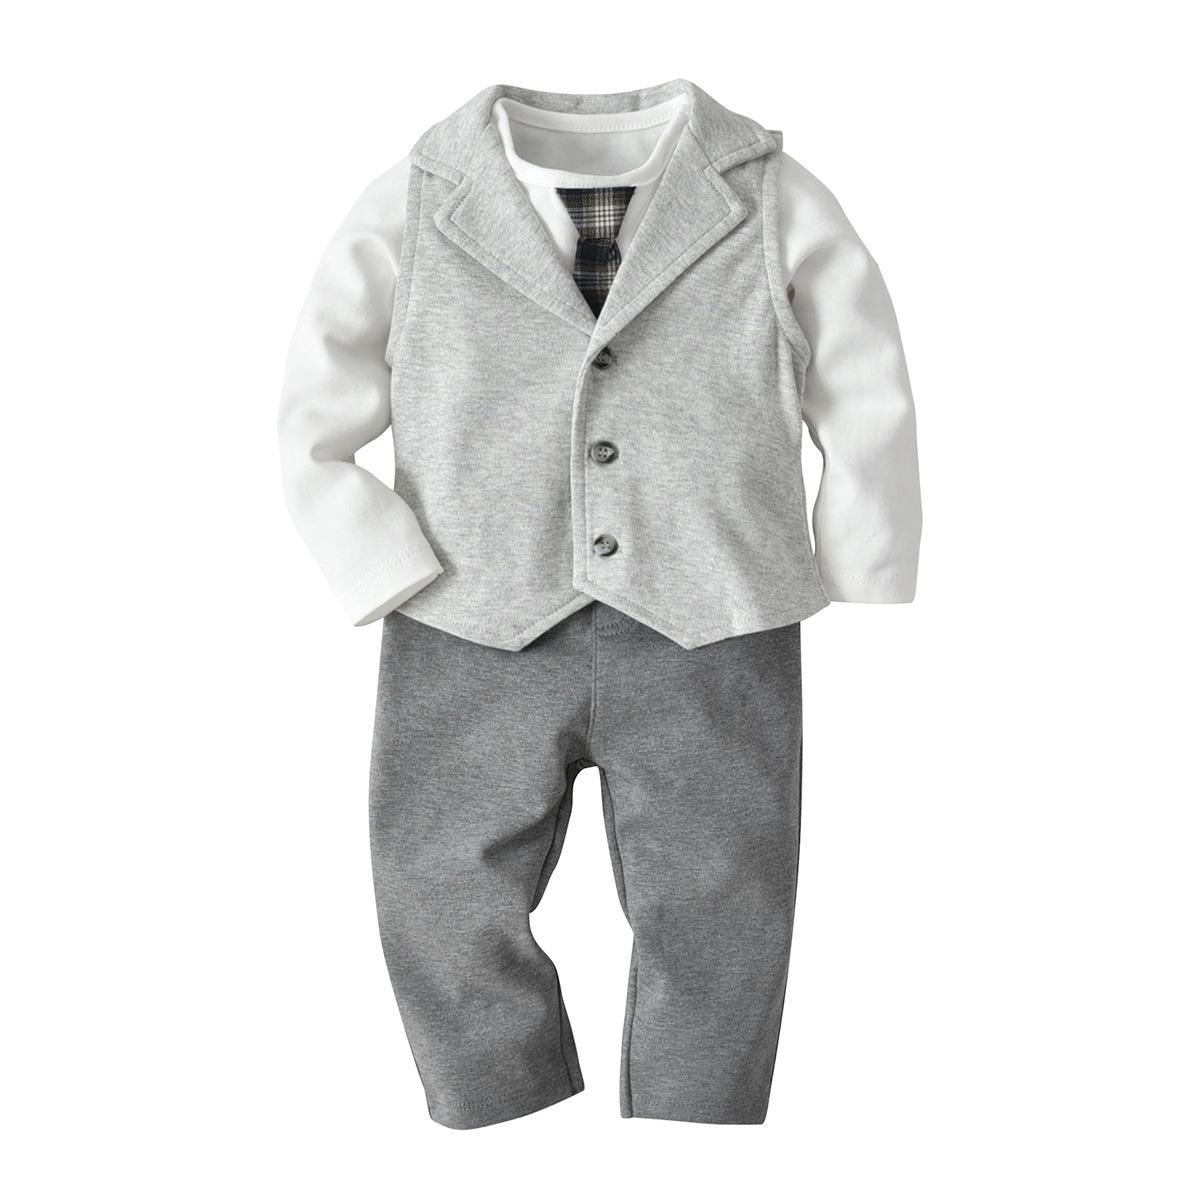 5d14dd03ac4a Toddler Baby Boys Clothing Set Infant Newborn Bodysuit Rompers ...